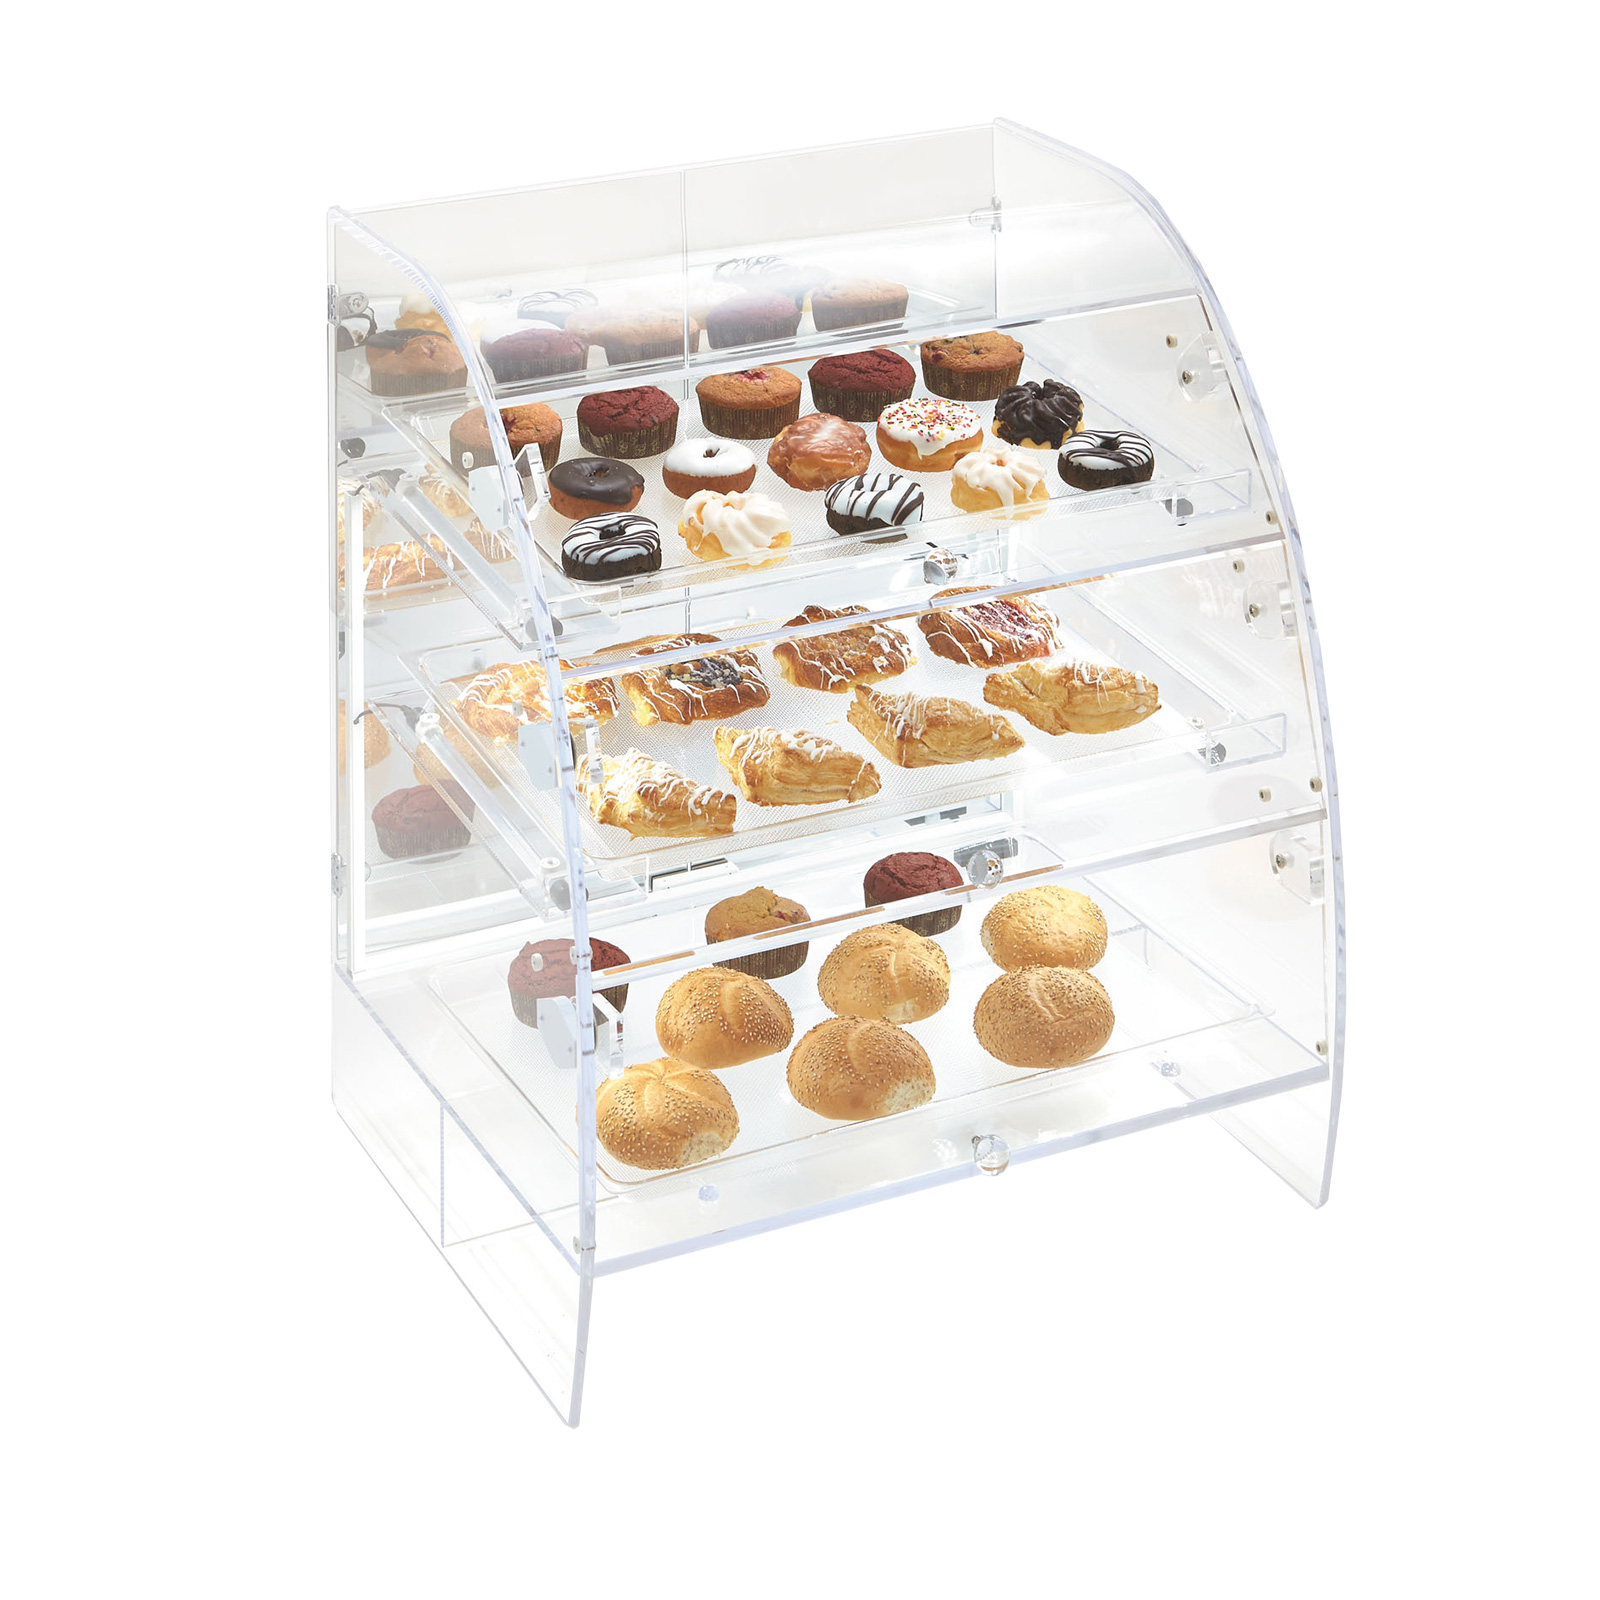 Vollrath XLBC3P-1826-13 display case, pastry, countertop